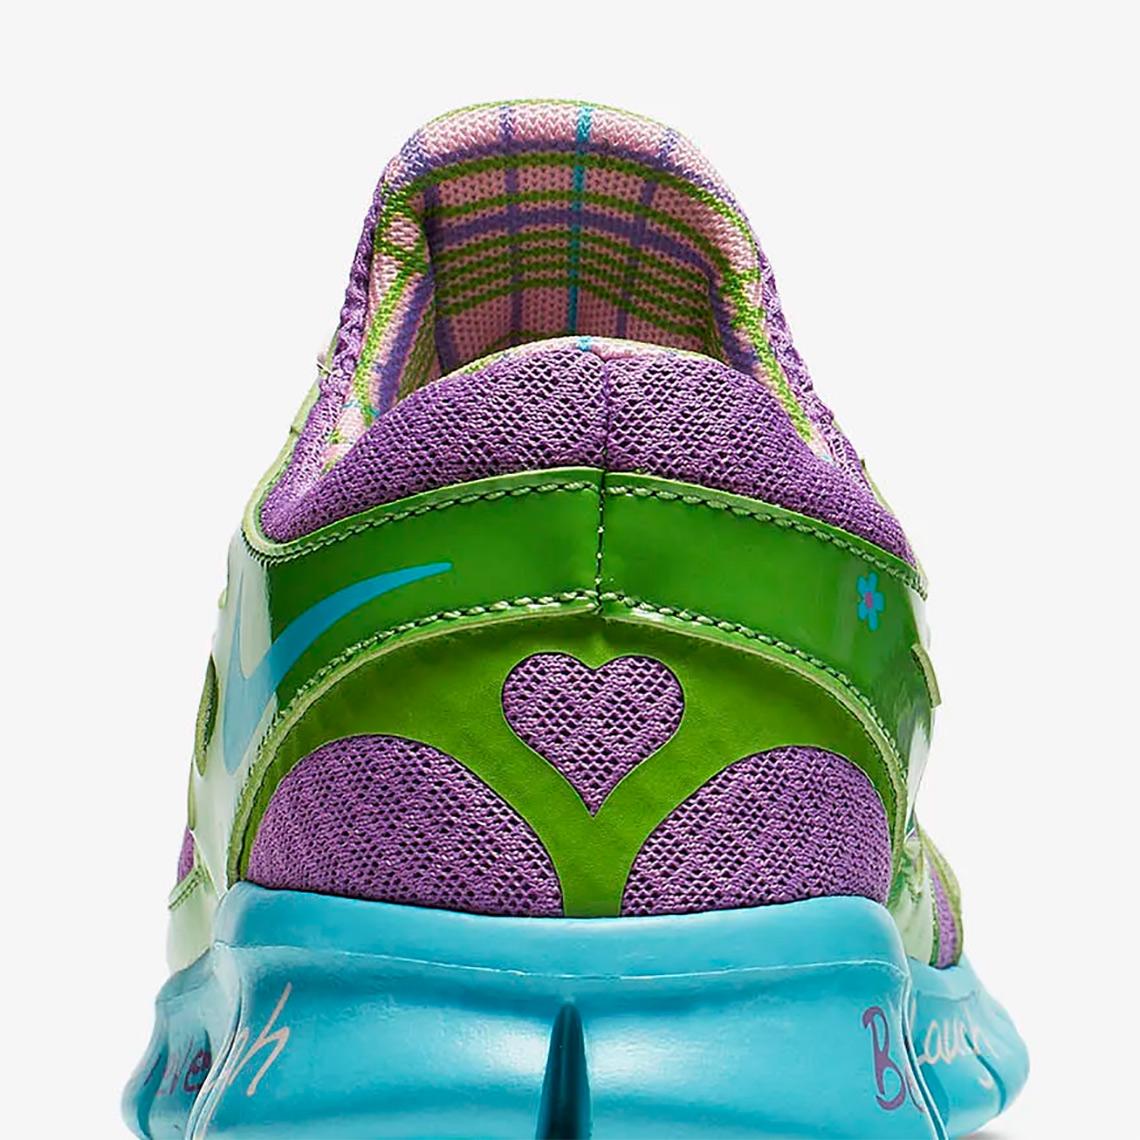 bba8e6cbeb22e Nike Free Run 2 Doernbecher 437527-543 Release Info